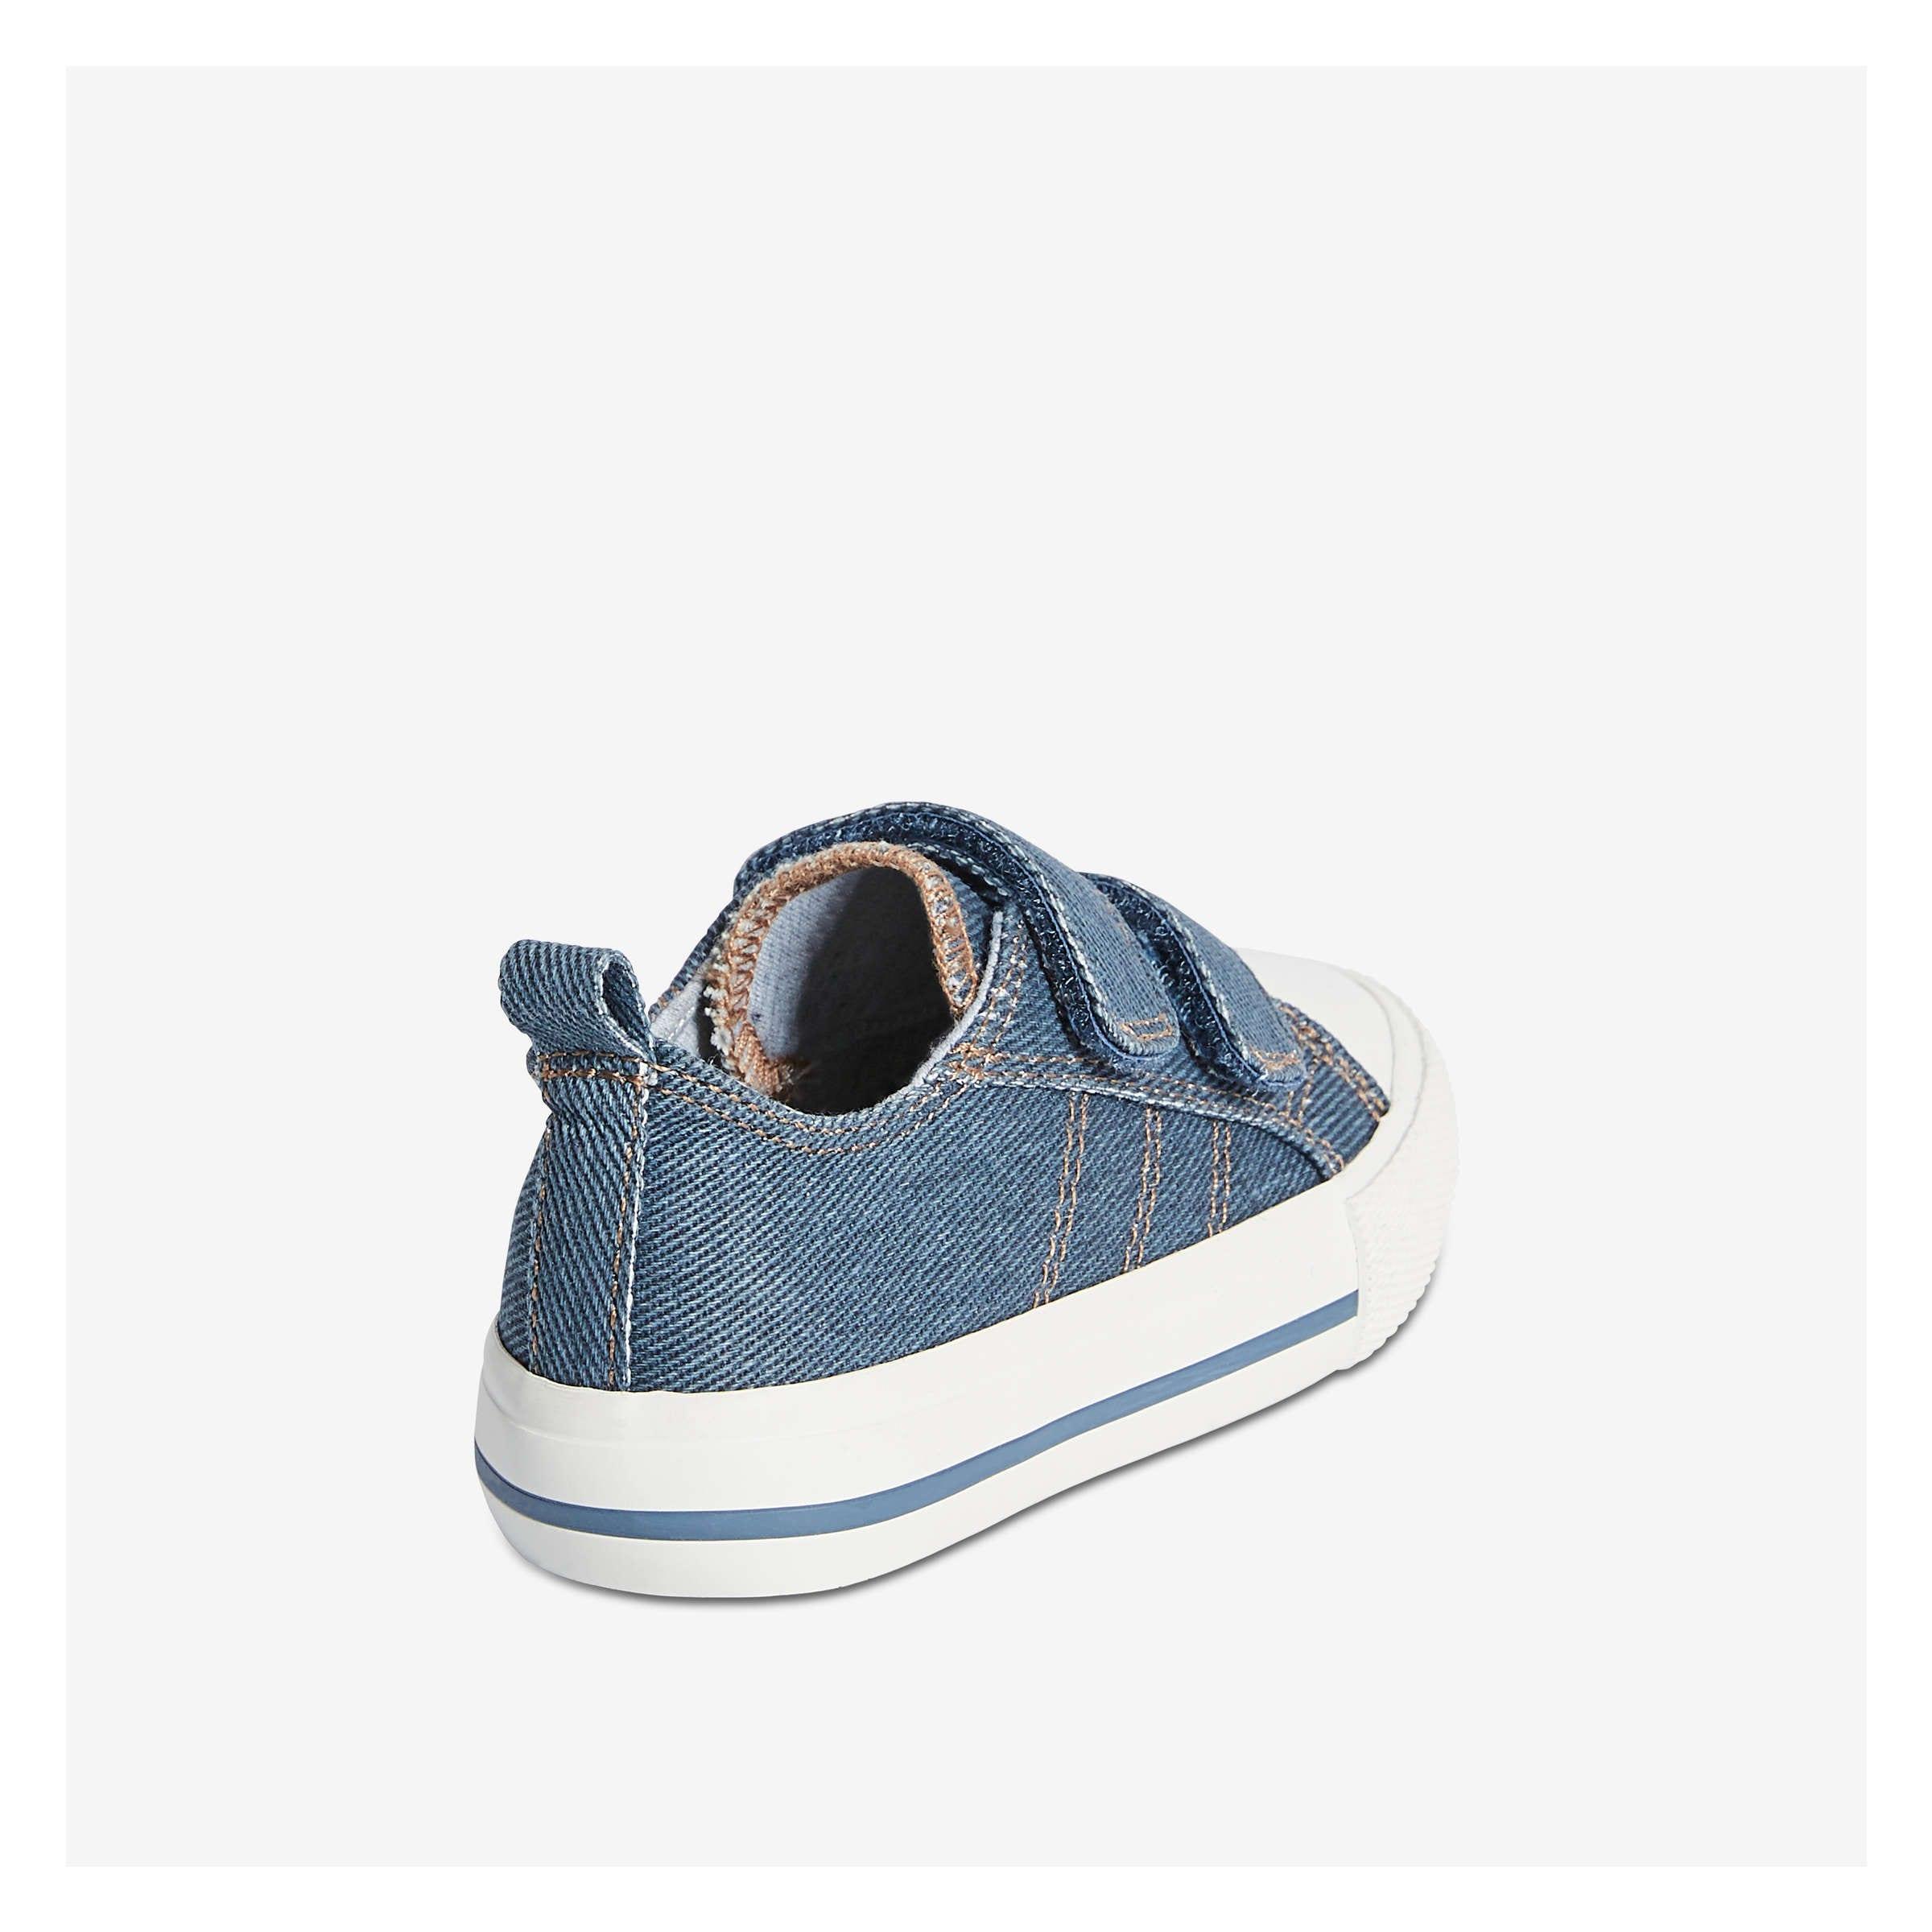 76d8ac72a3b90 Joe Fresh Baby Boys' Sneakers